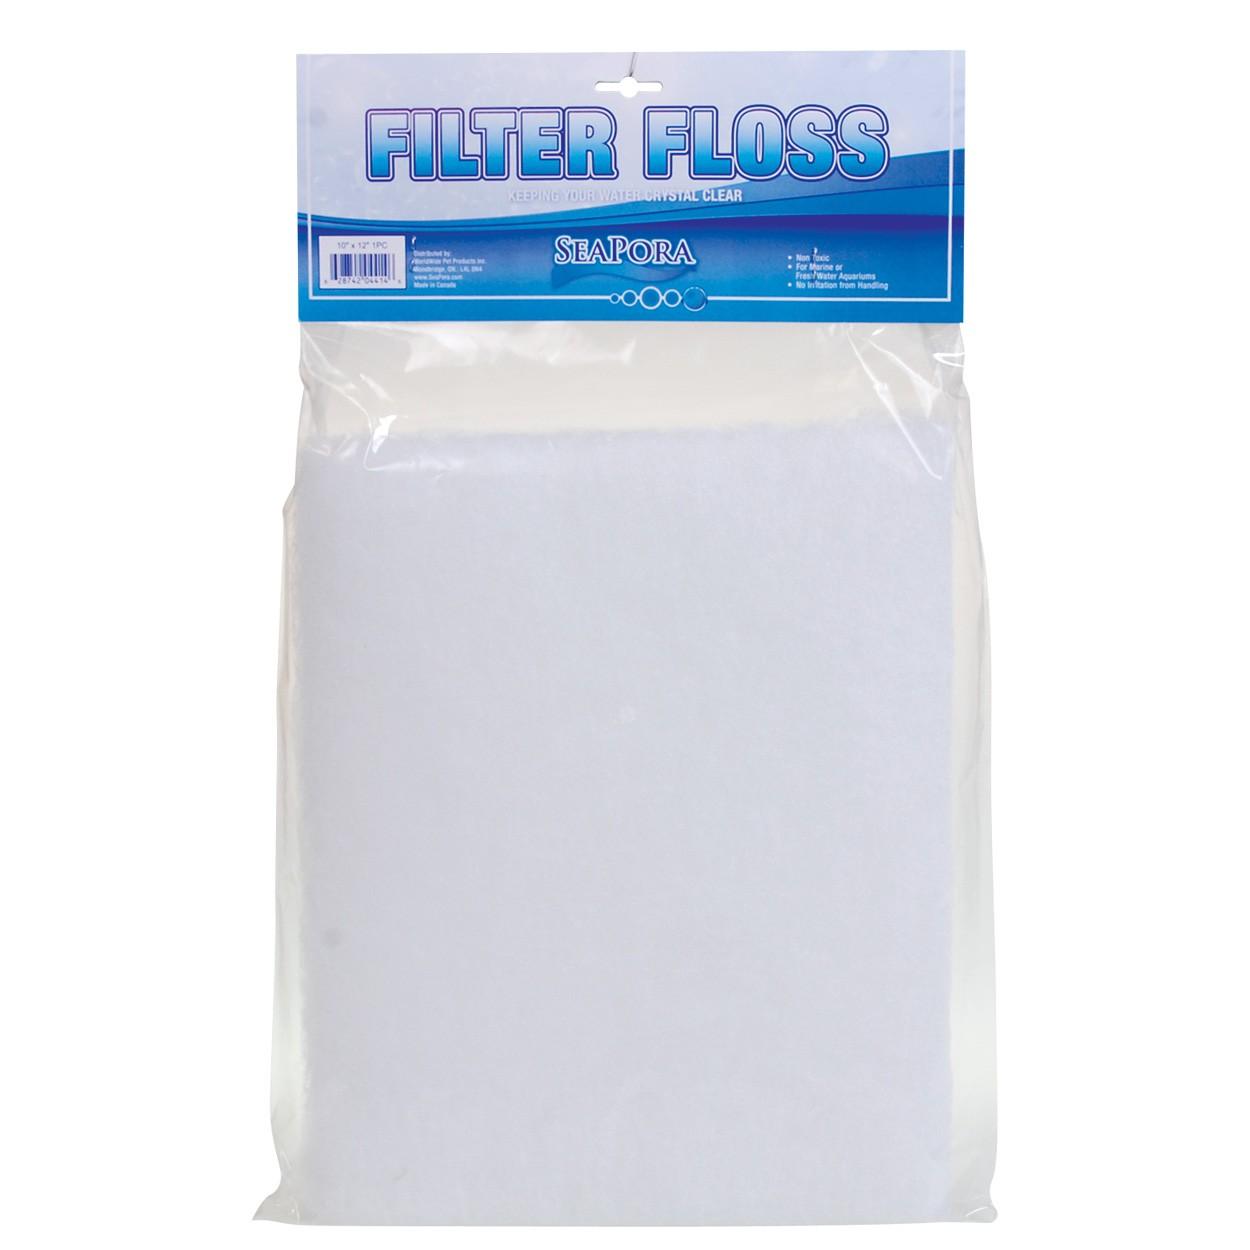 "SeaPora Filter Floss Pad - 10"" x 12"" - 2 pk"